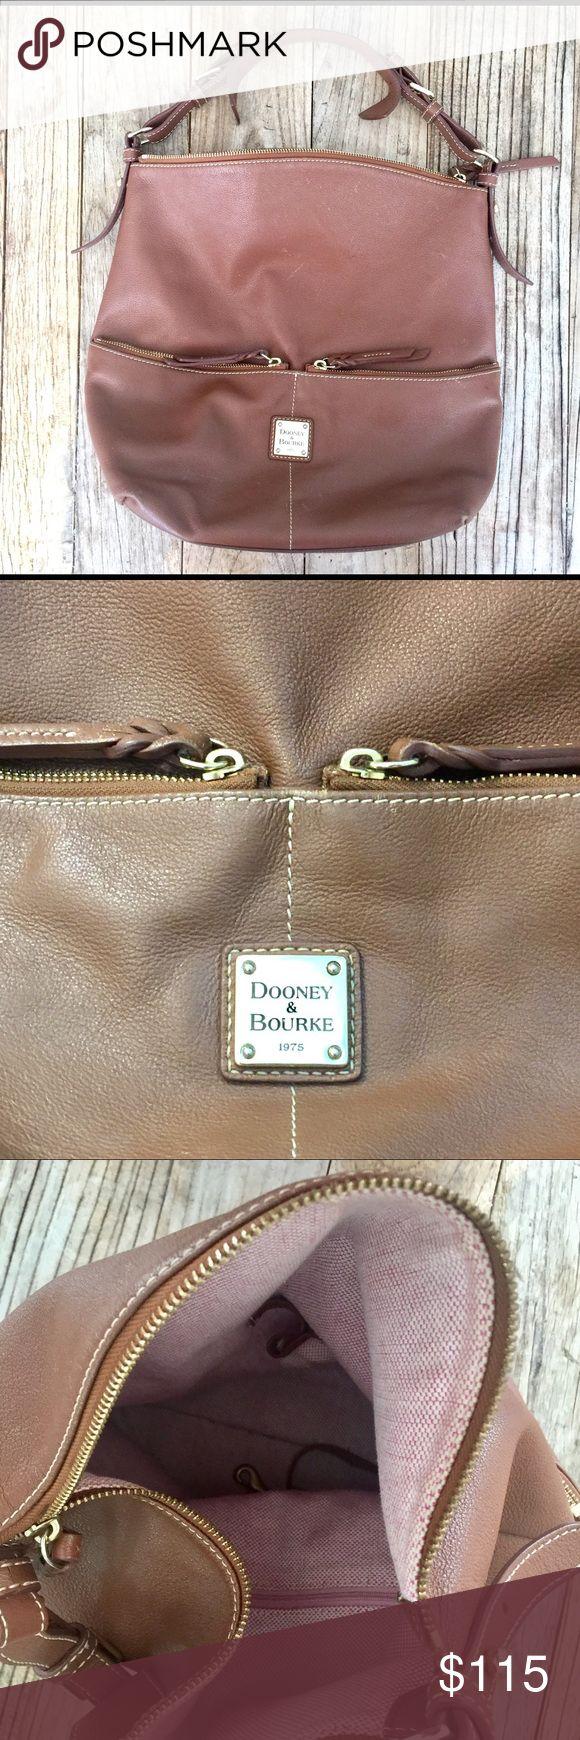 Dooney & Bourke leather hobo / shoulder bag. EUC Dooney & Bourke leather  hobo / bucket shoulder shoulder bag. Great color, beautiful leather. Perfect everyday bag. Dooney & Bourke Bags Shoulder Bags